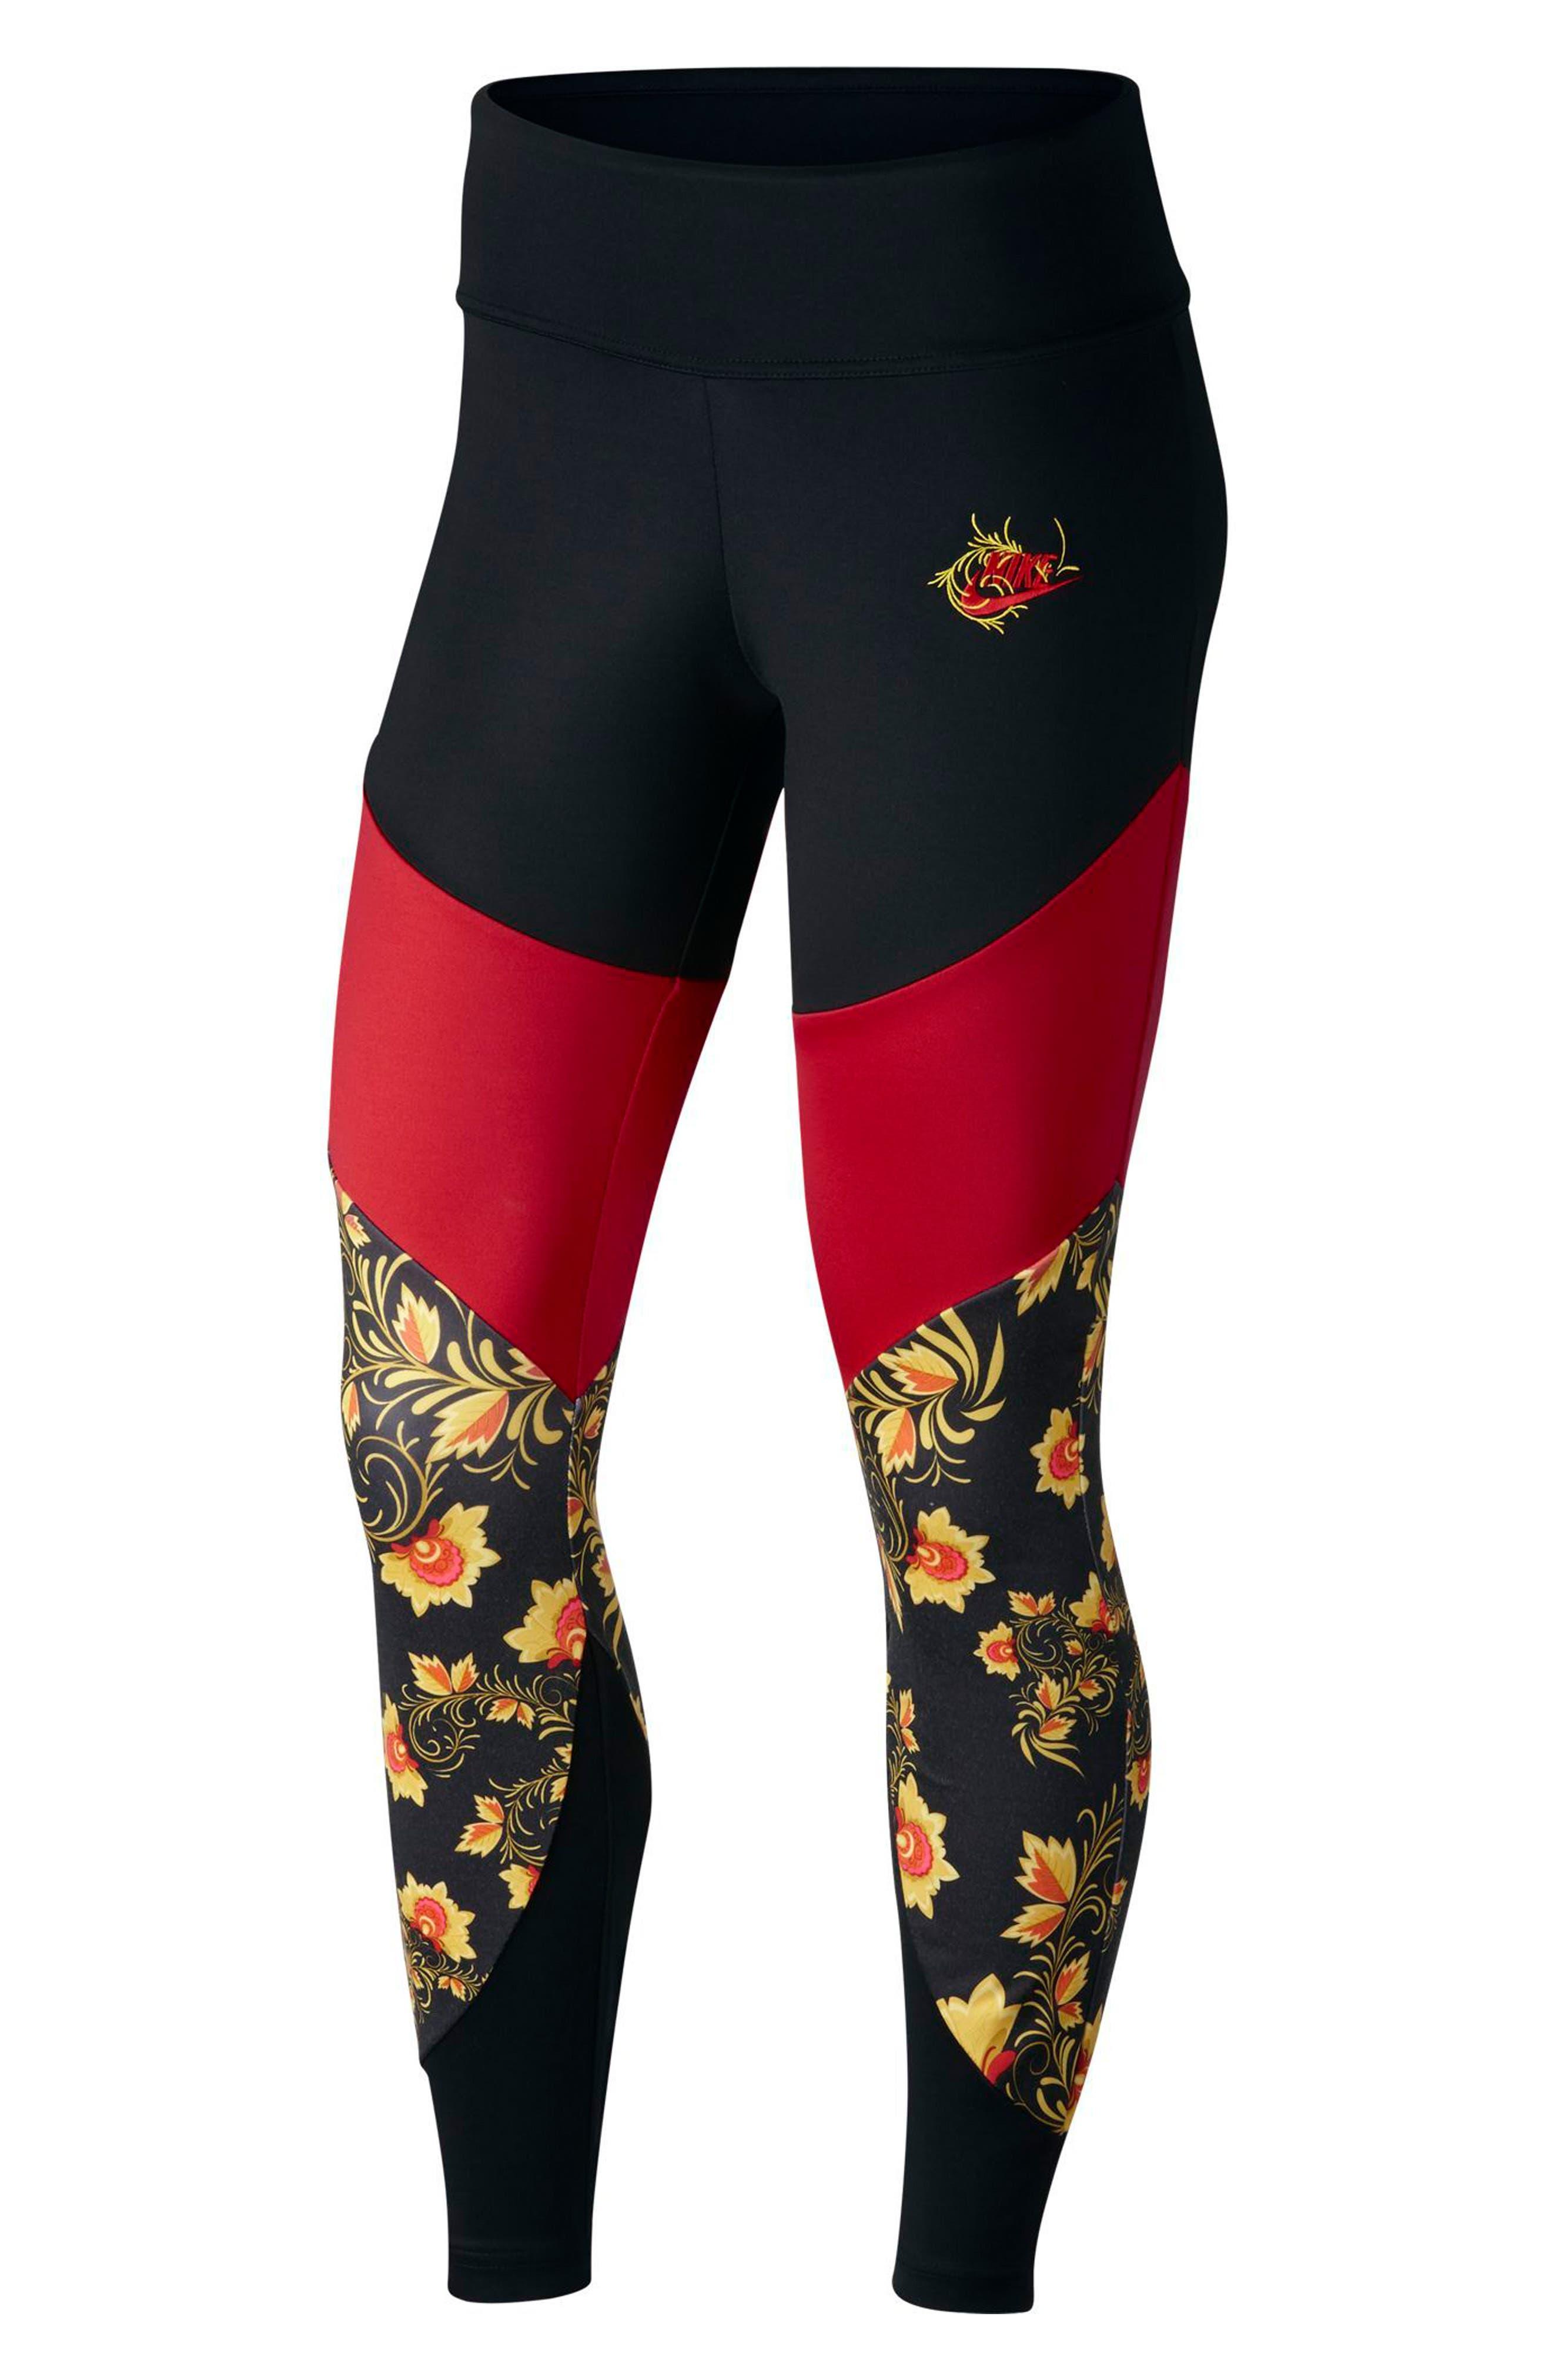 Sportswear Essential Colorblock Floral Women's Leggings,                         Main,                         color, 010